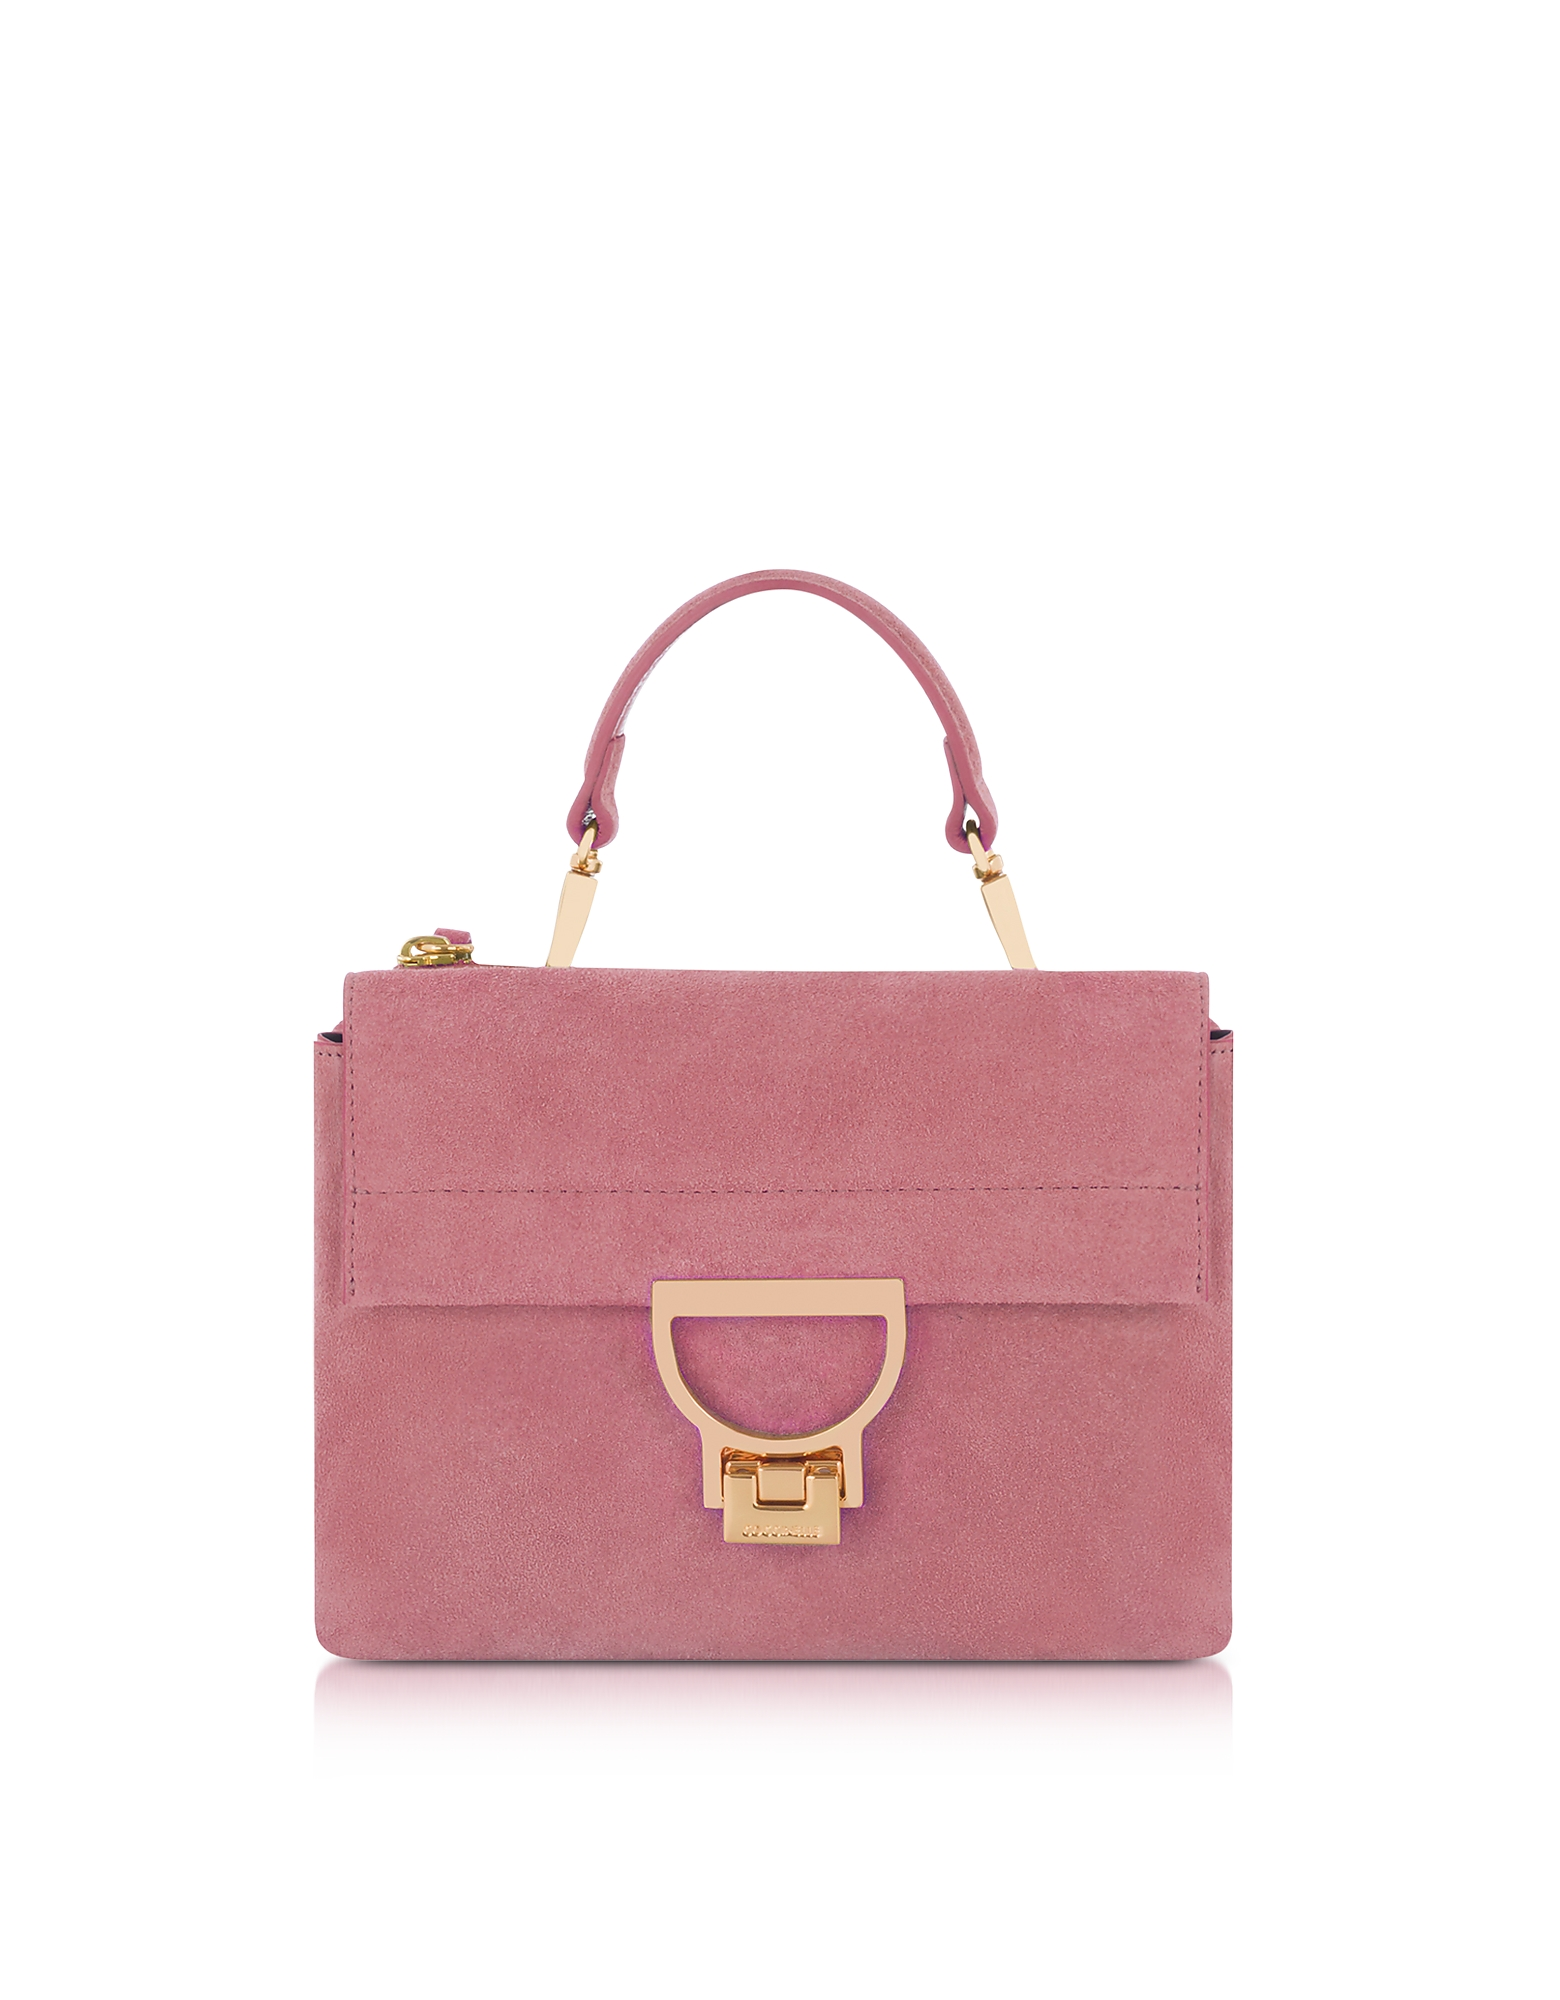 Coccinelle Handbags, Milkshake Suede Arlettis Mini Bag w/Shoulder Strap